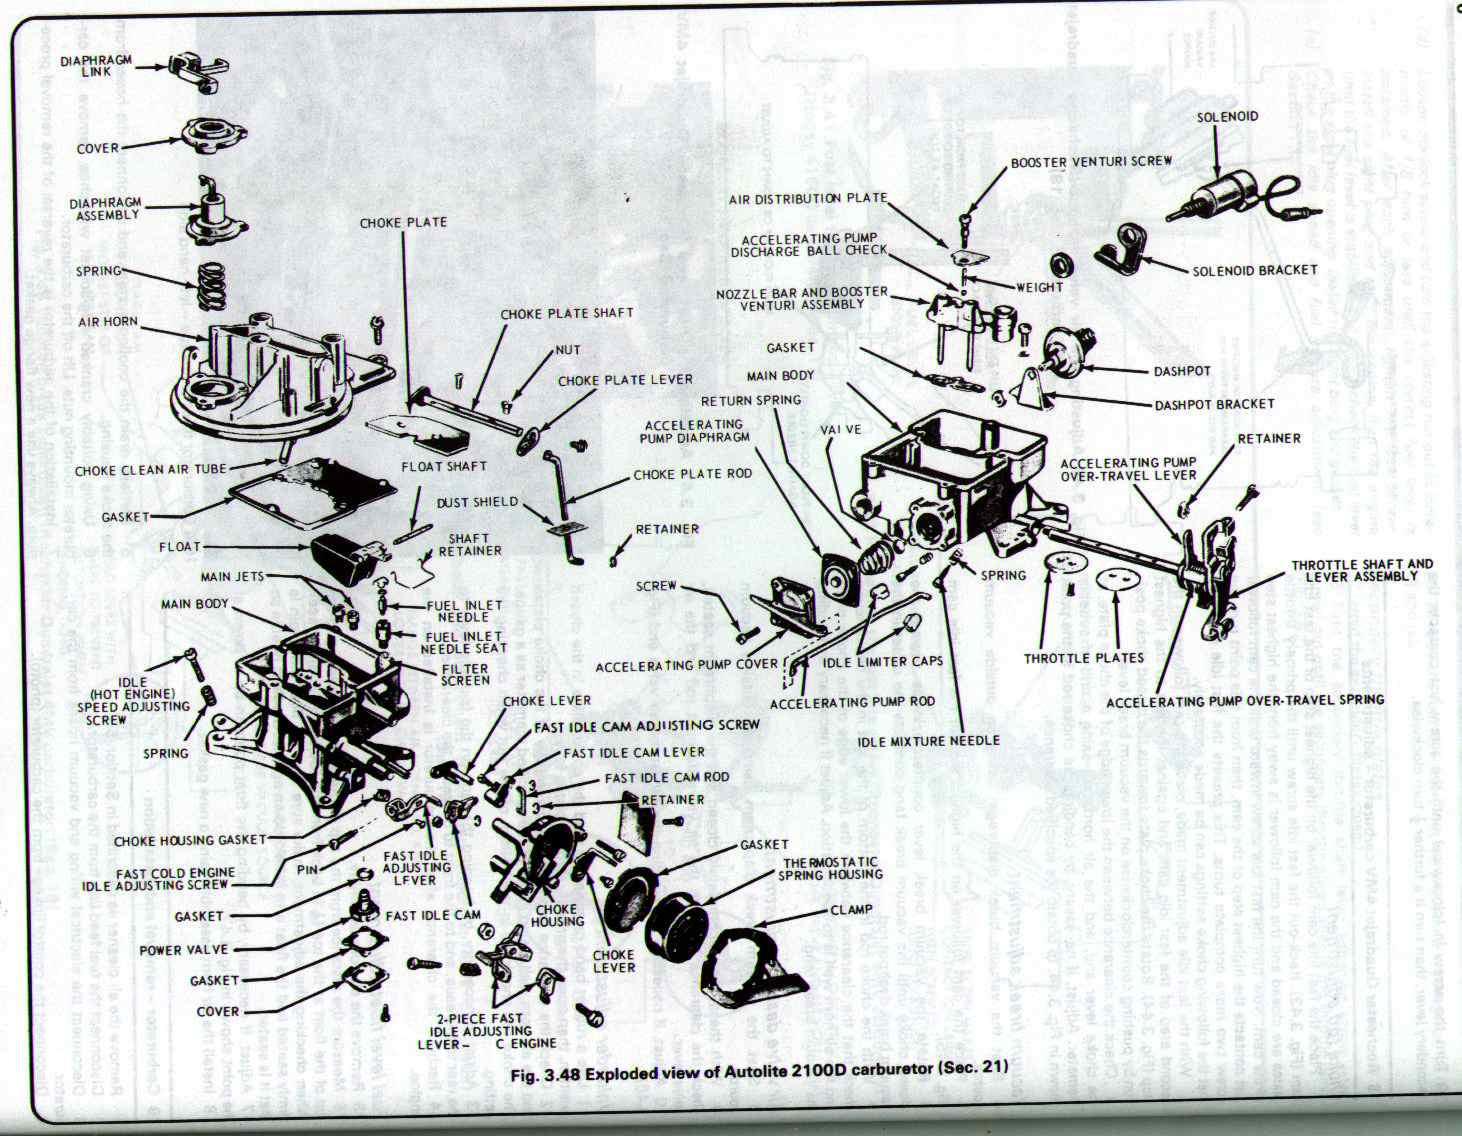 Magnificent Leaking Carb Vintage Mustang Forums Wiring Database Ilarigelartorg